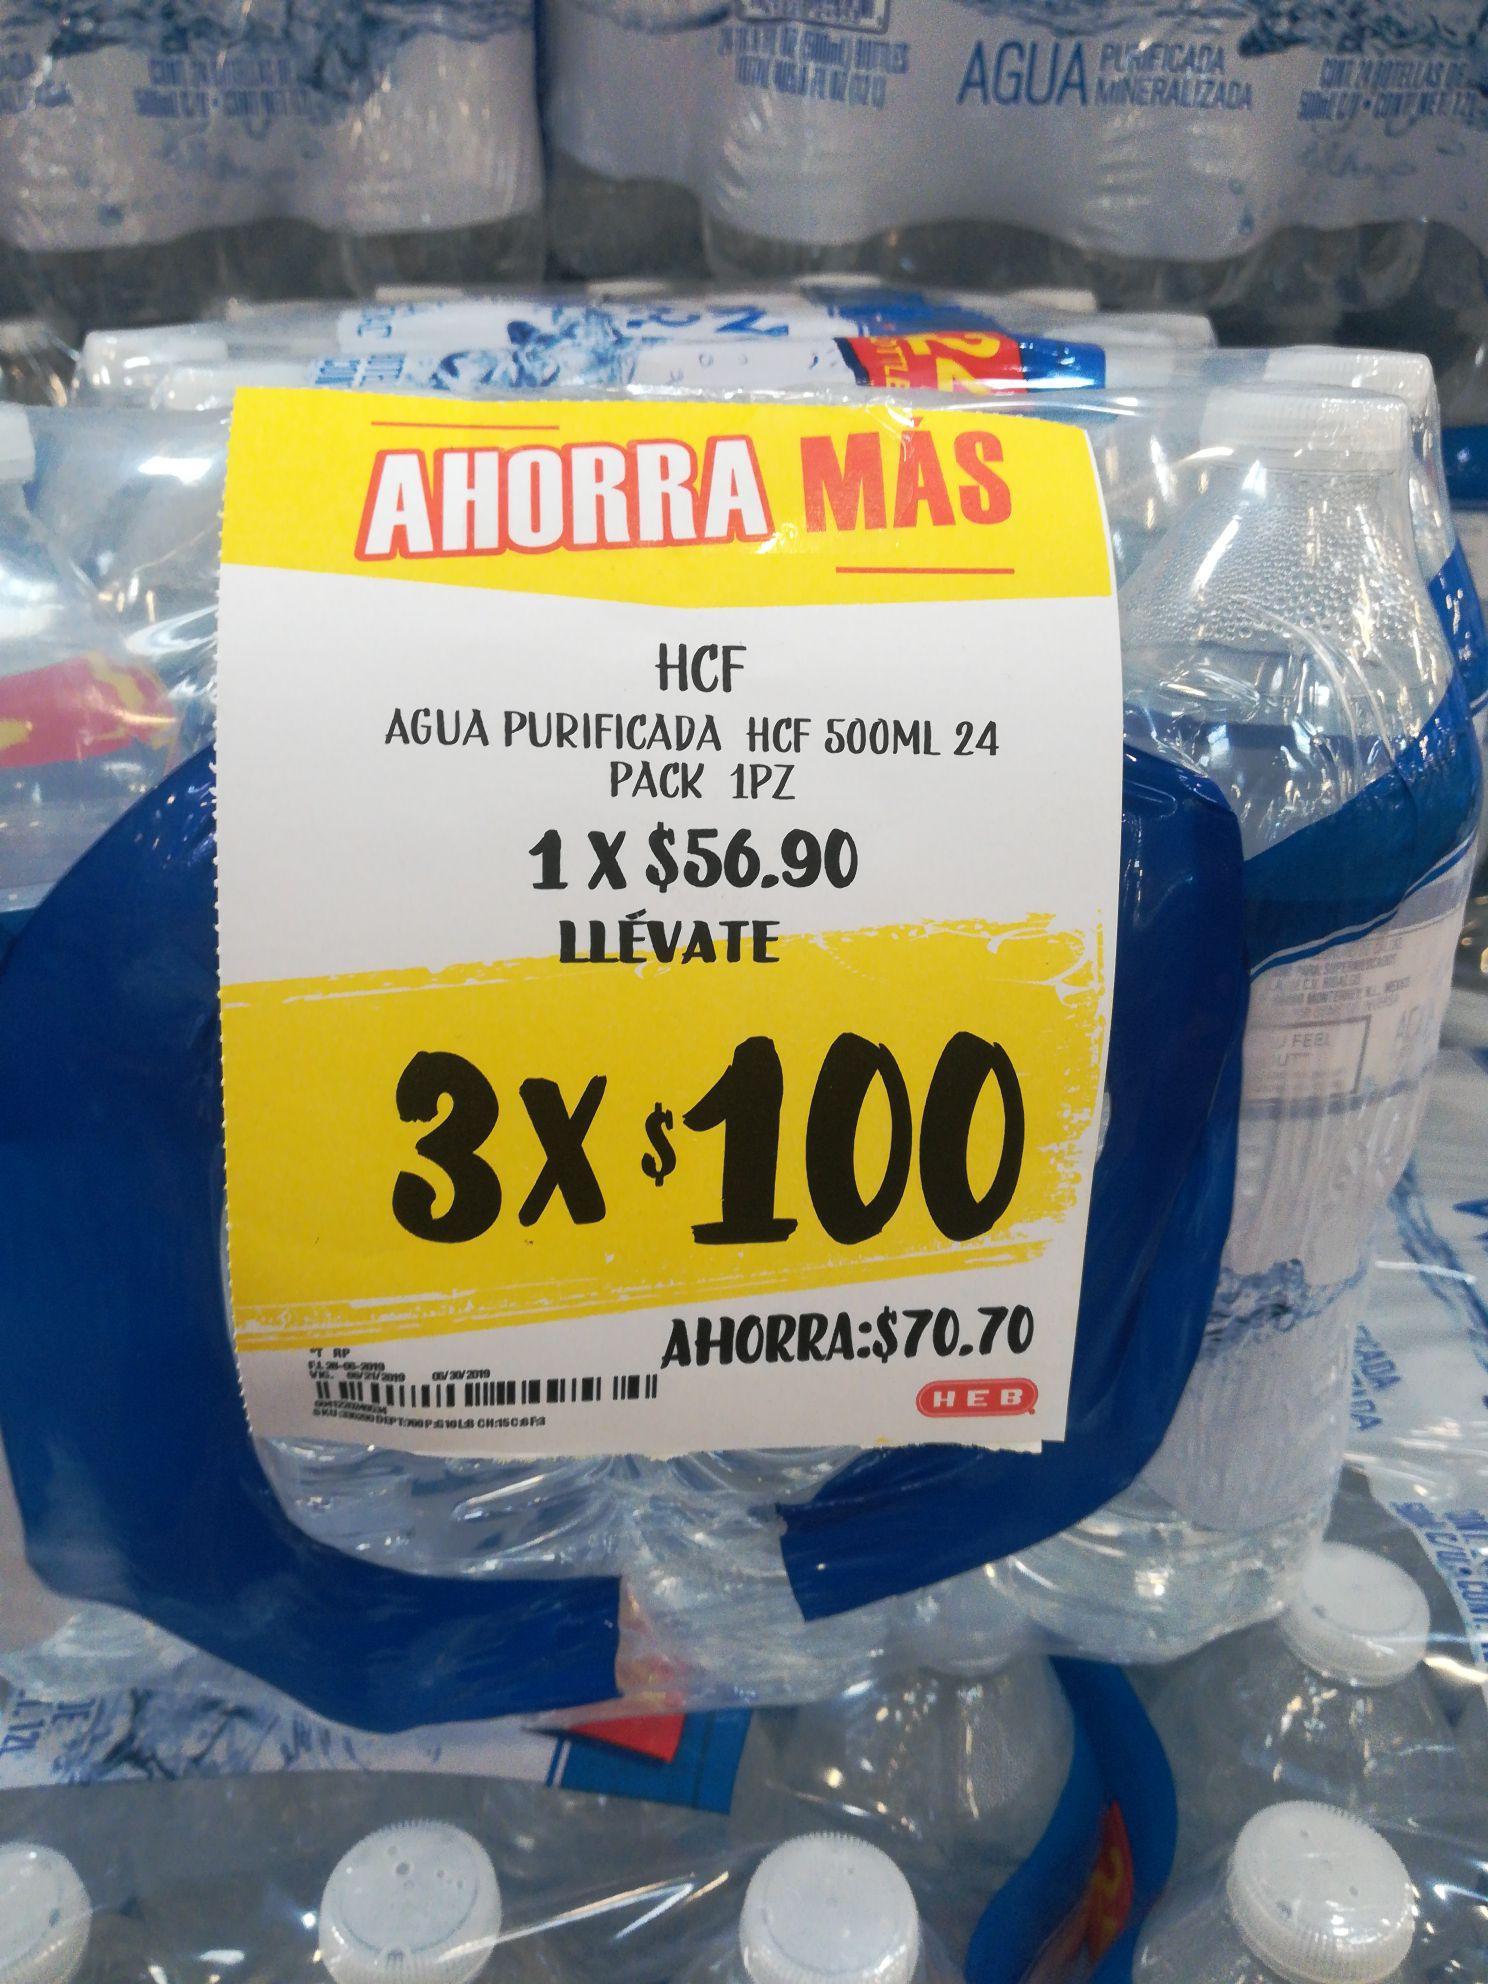 HEB: Agua purificada HCF 24-pack de 500ml a 3x$100